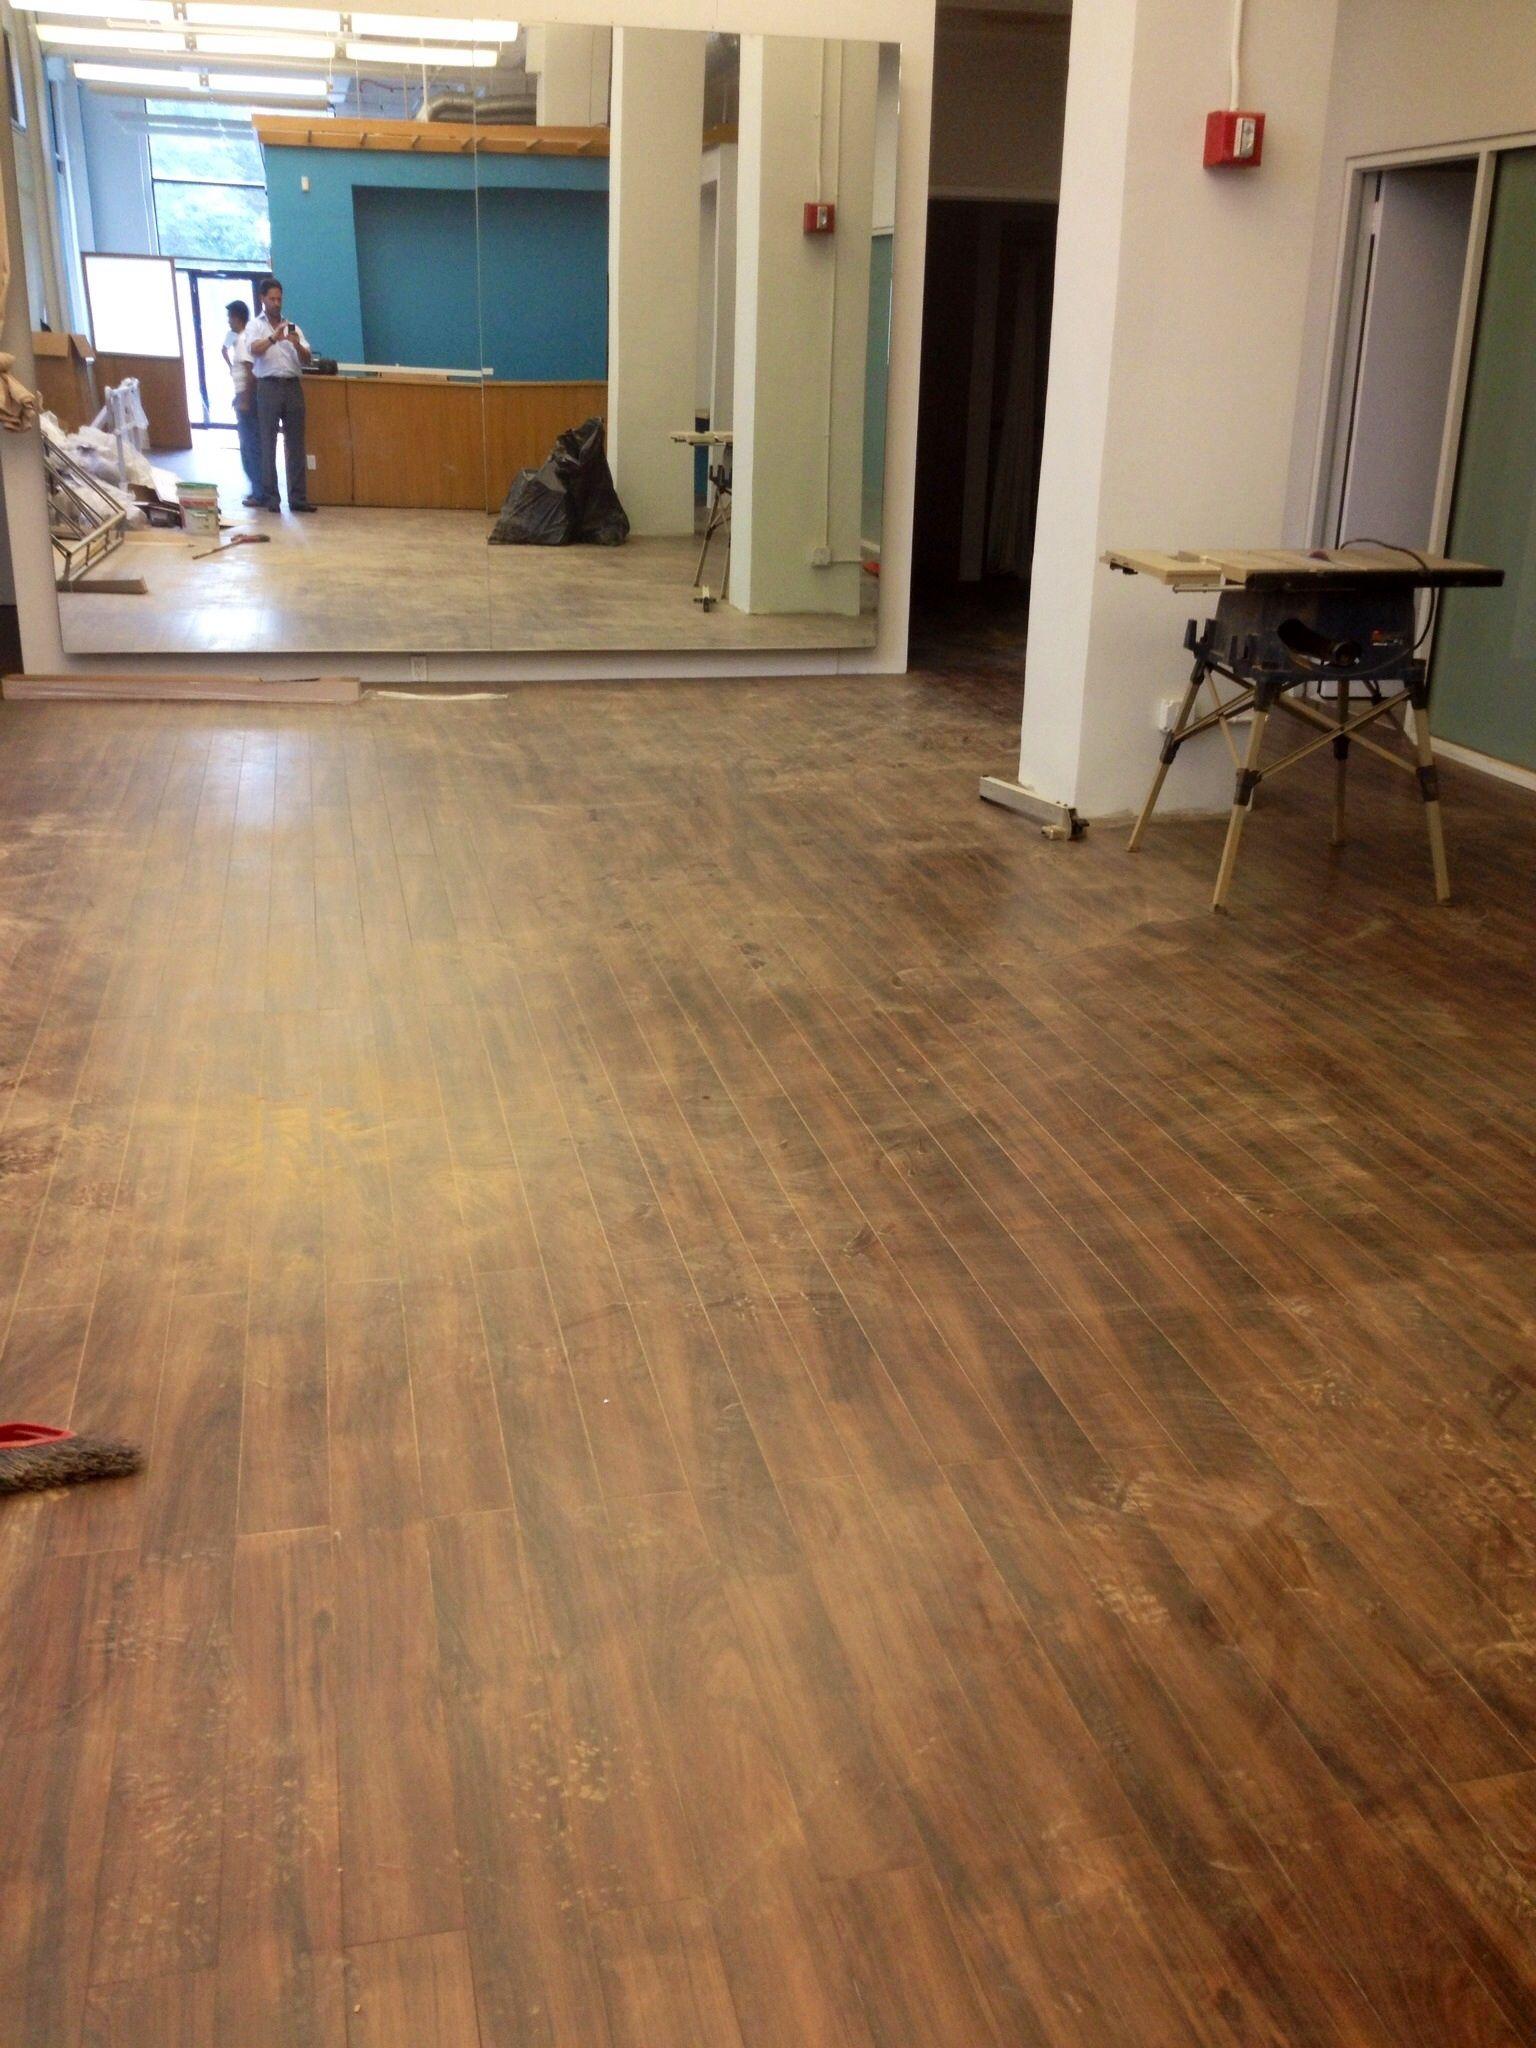 Kaindl laminate flooring 24 hour urgent care nyc